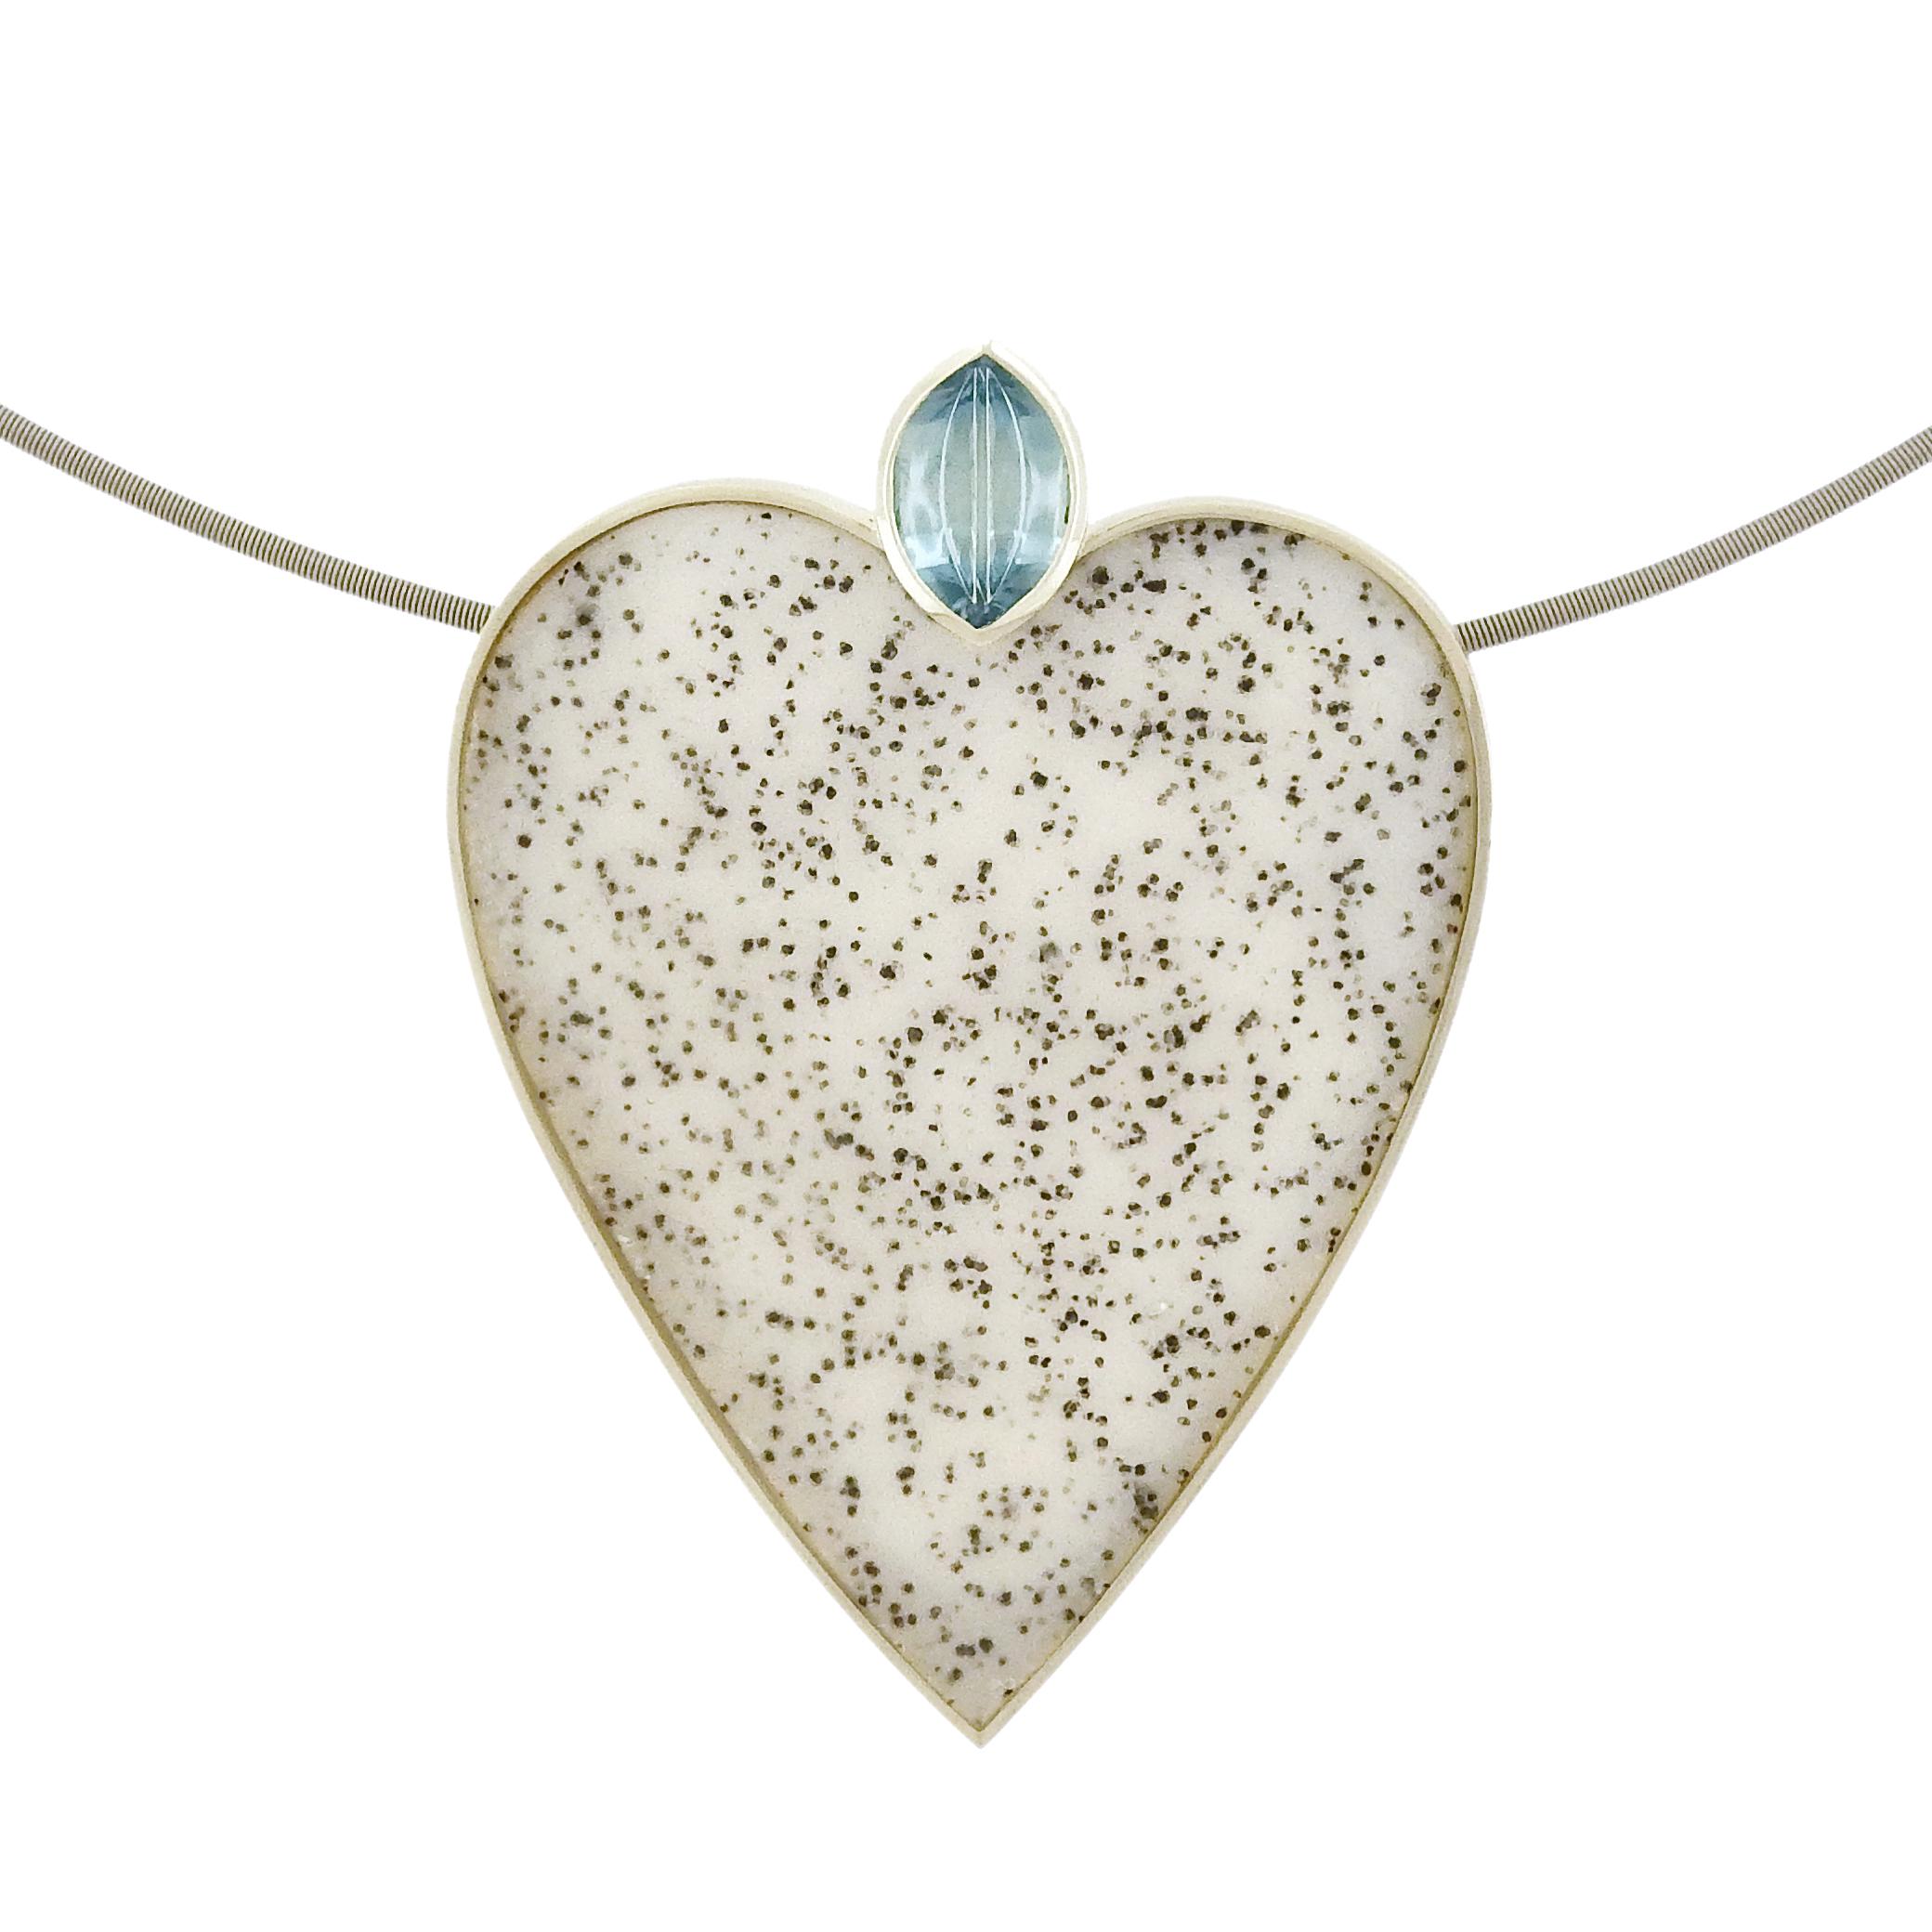 Tom jutta munsteiner gemstone heart pendant brooch aaron faber tom jutta munsteiner gemstone heart pendant brooch mozeypictures Image collections